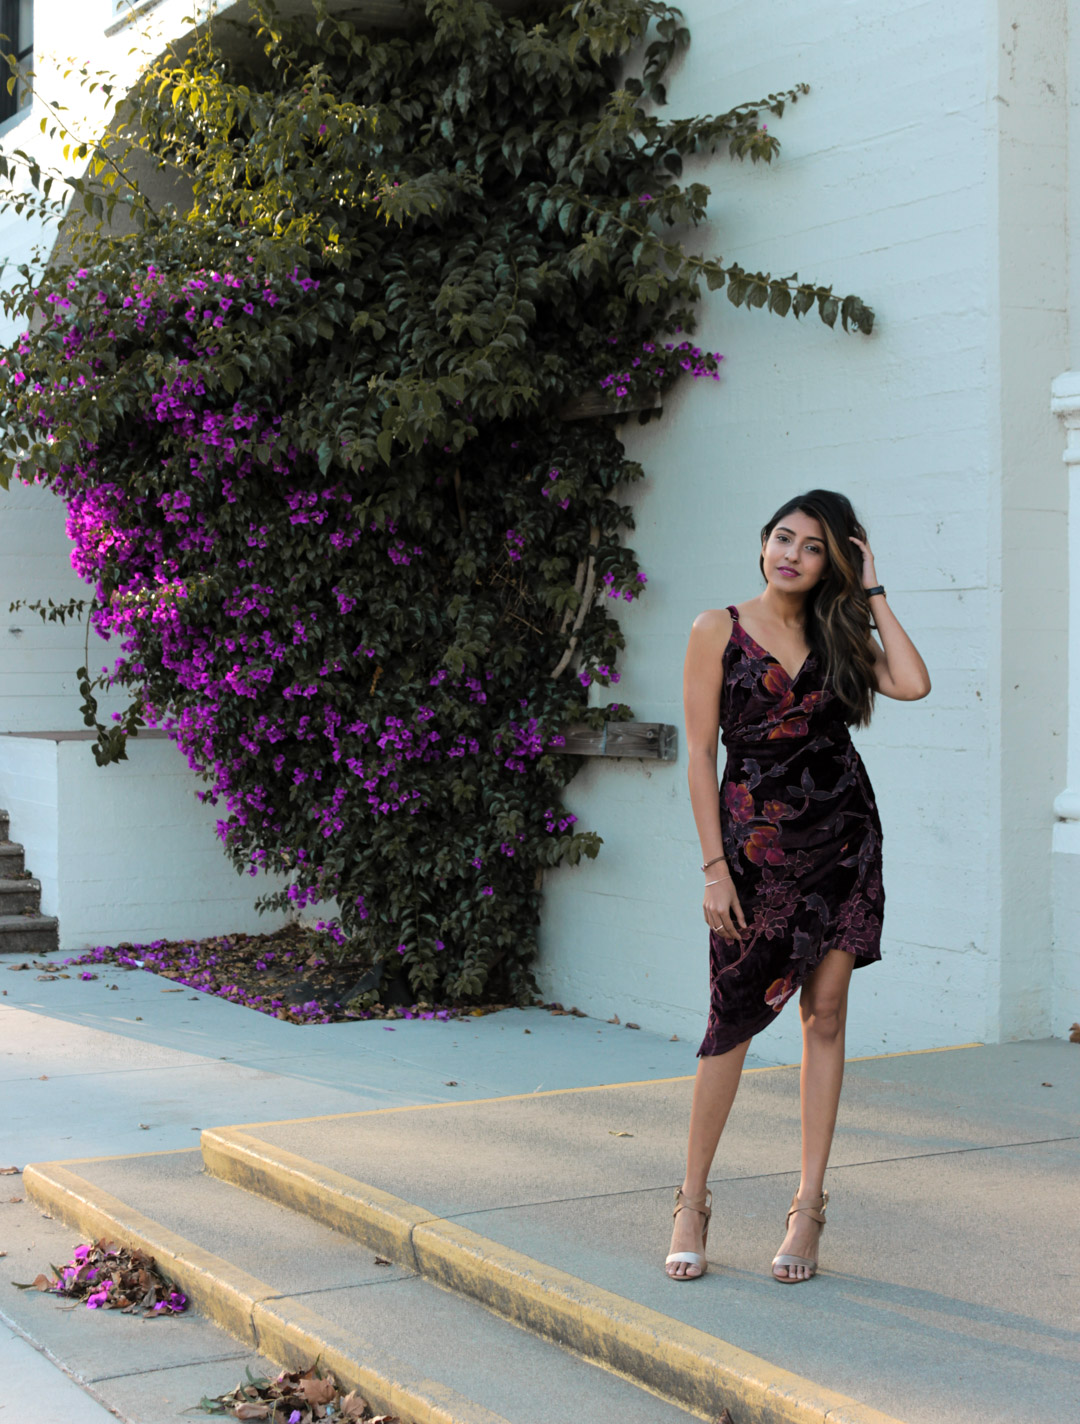 velvet-wrap-floral-dress-nye-party-blogger-outfit 3